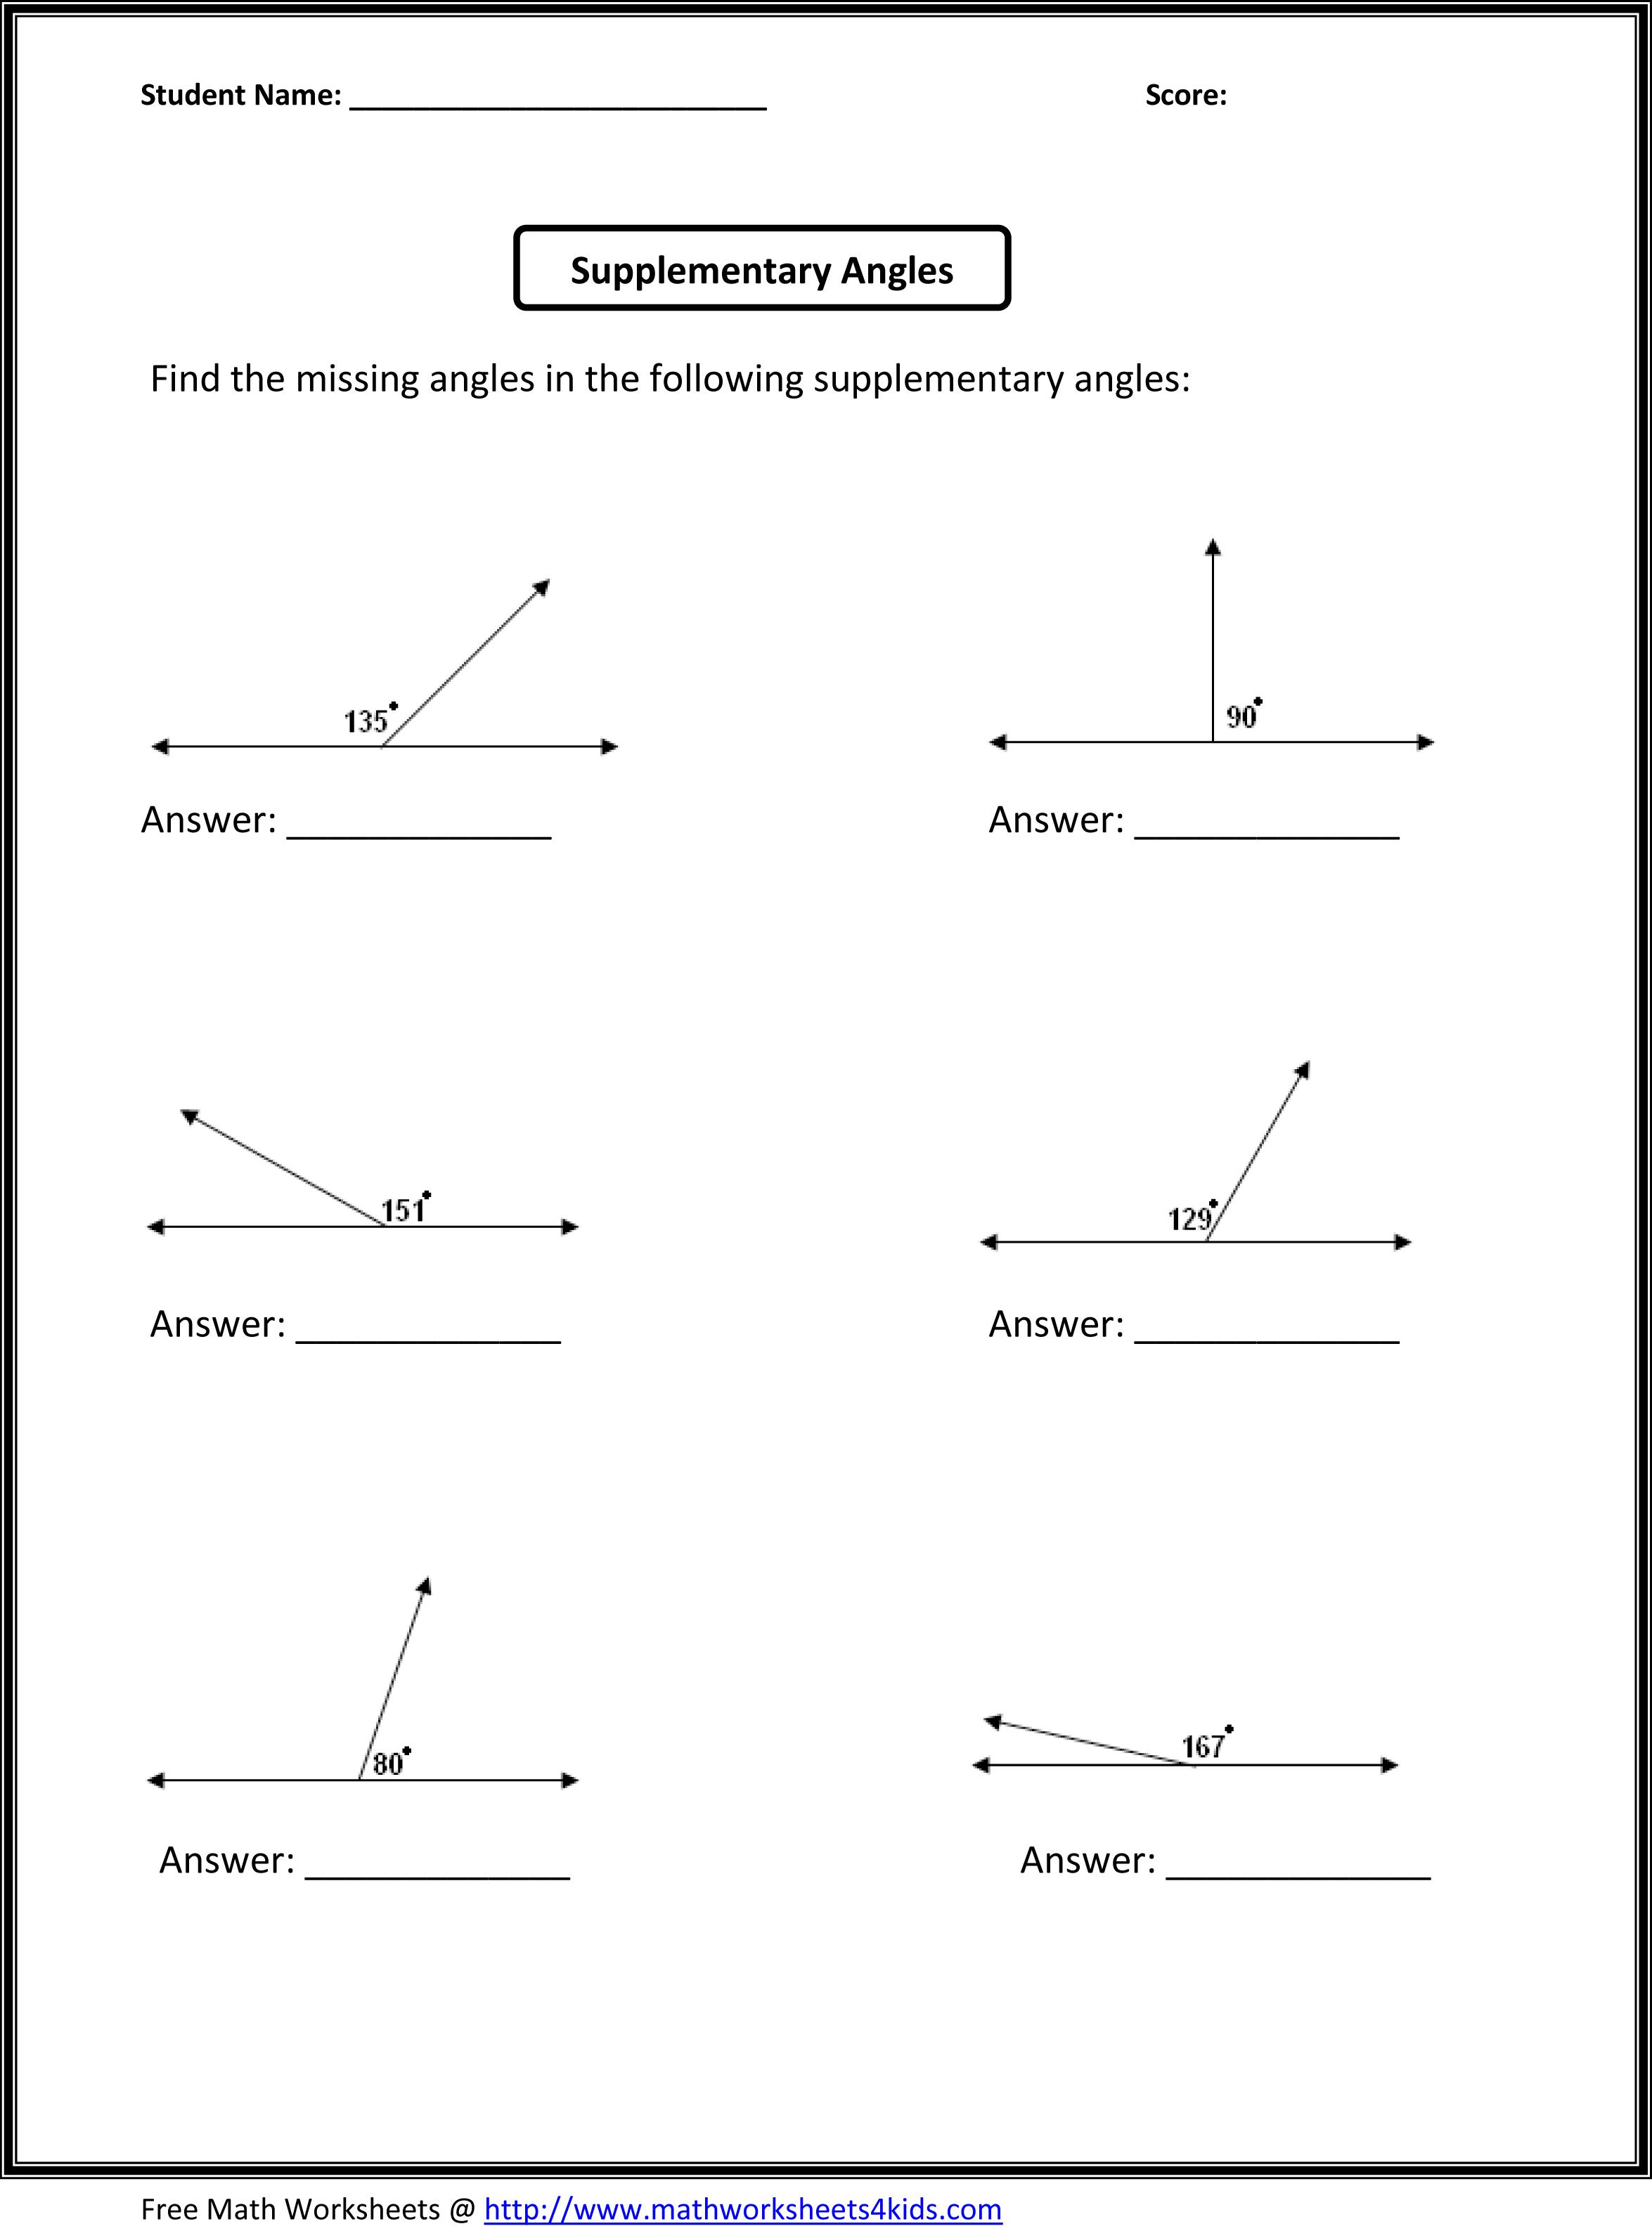 11 Best Images Of 6th Grade Math Challenge Worksheets